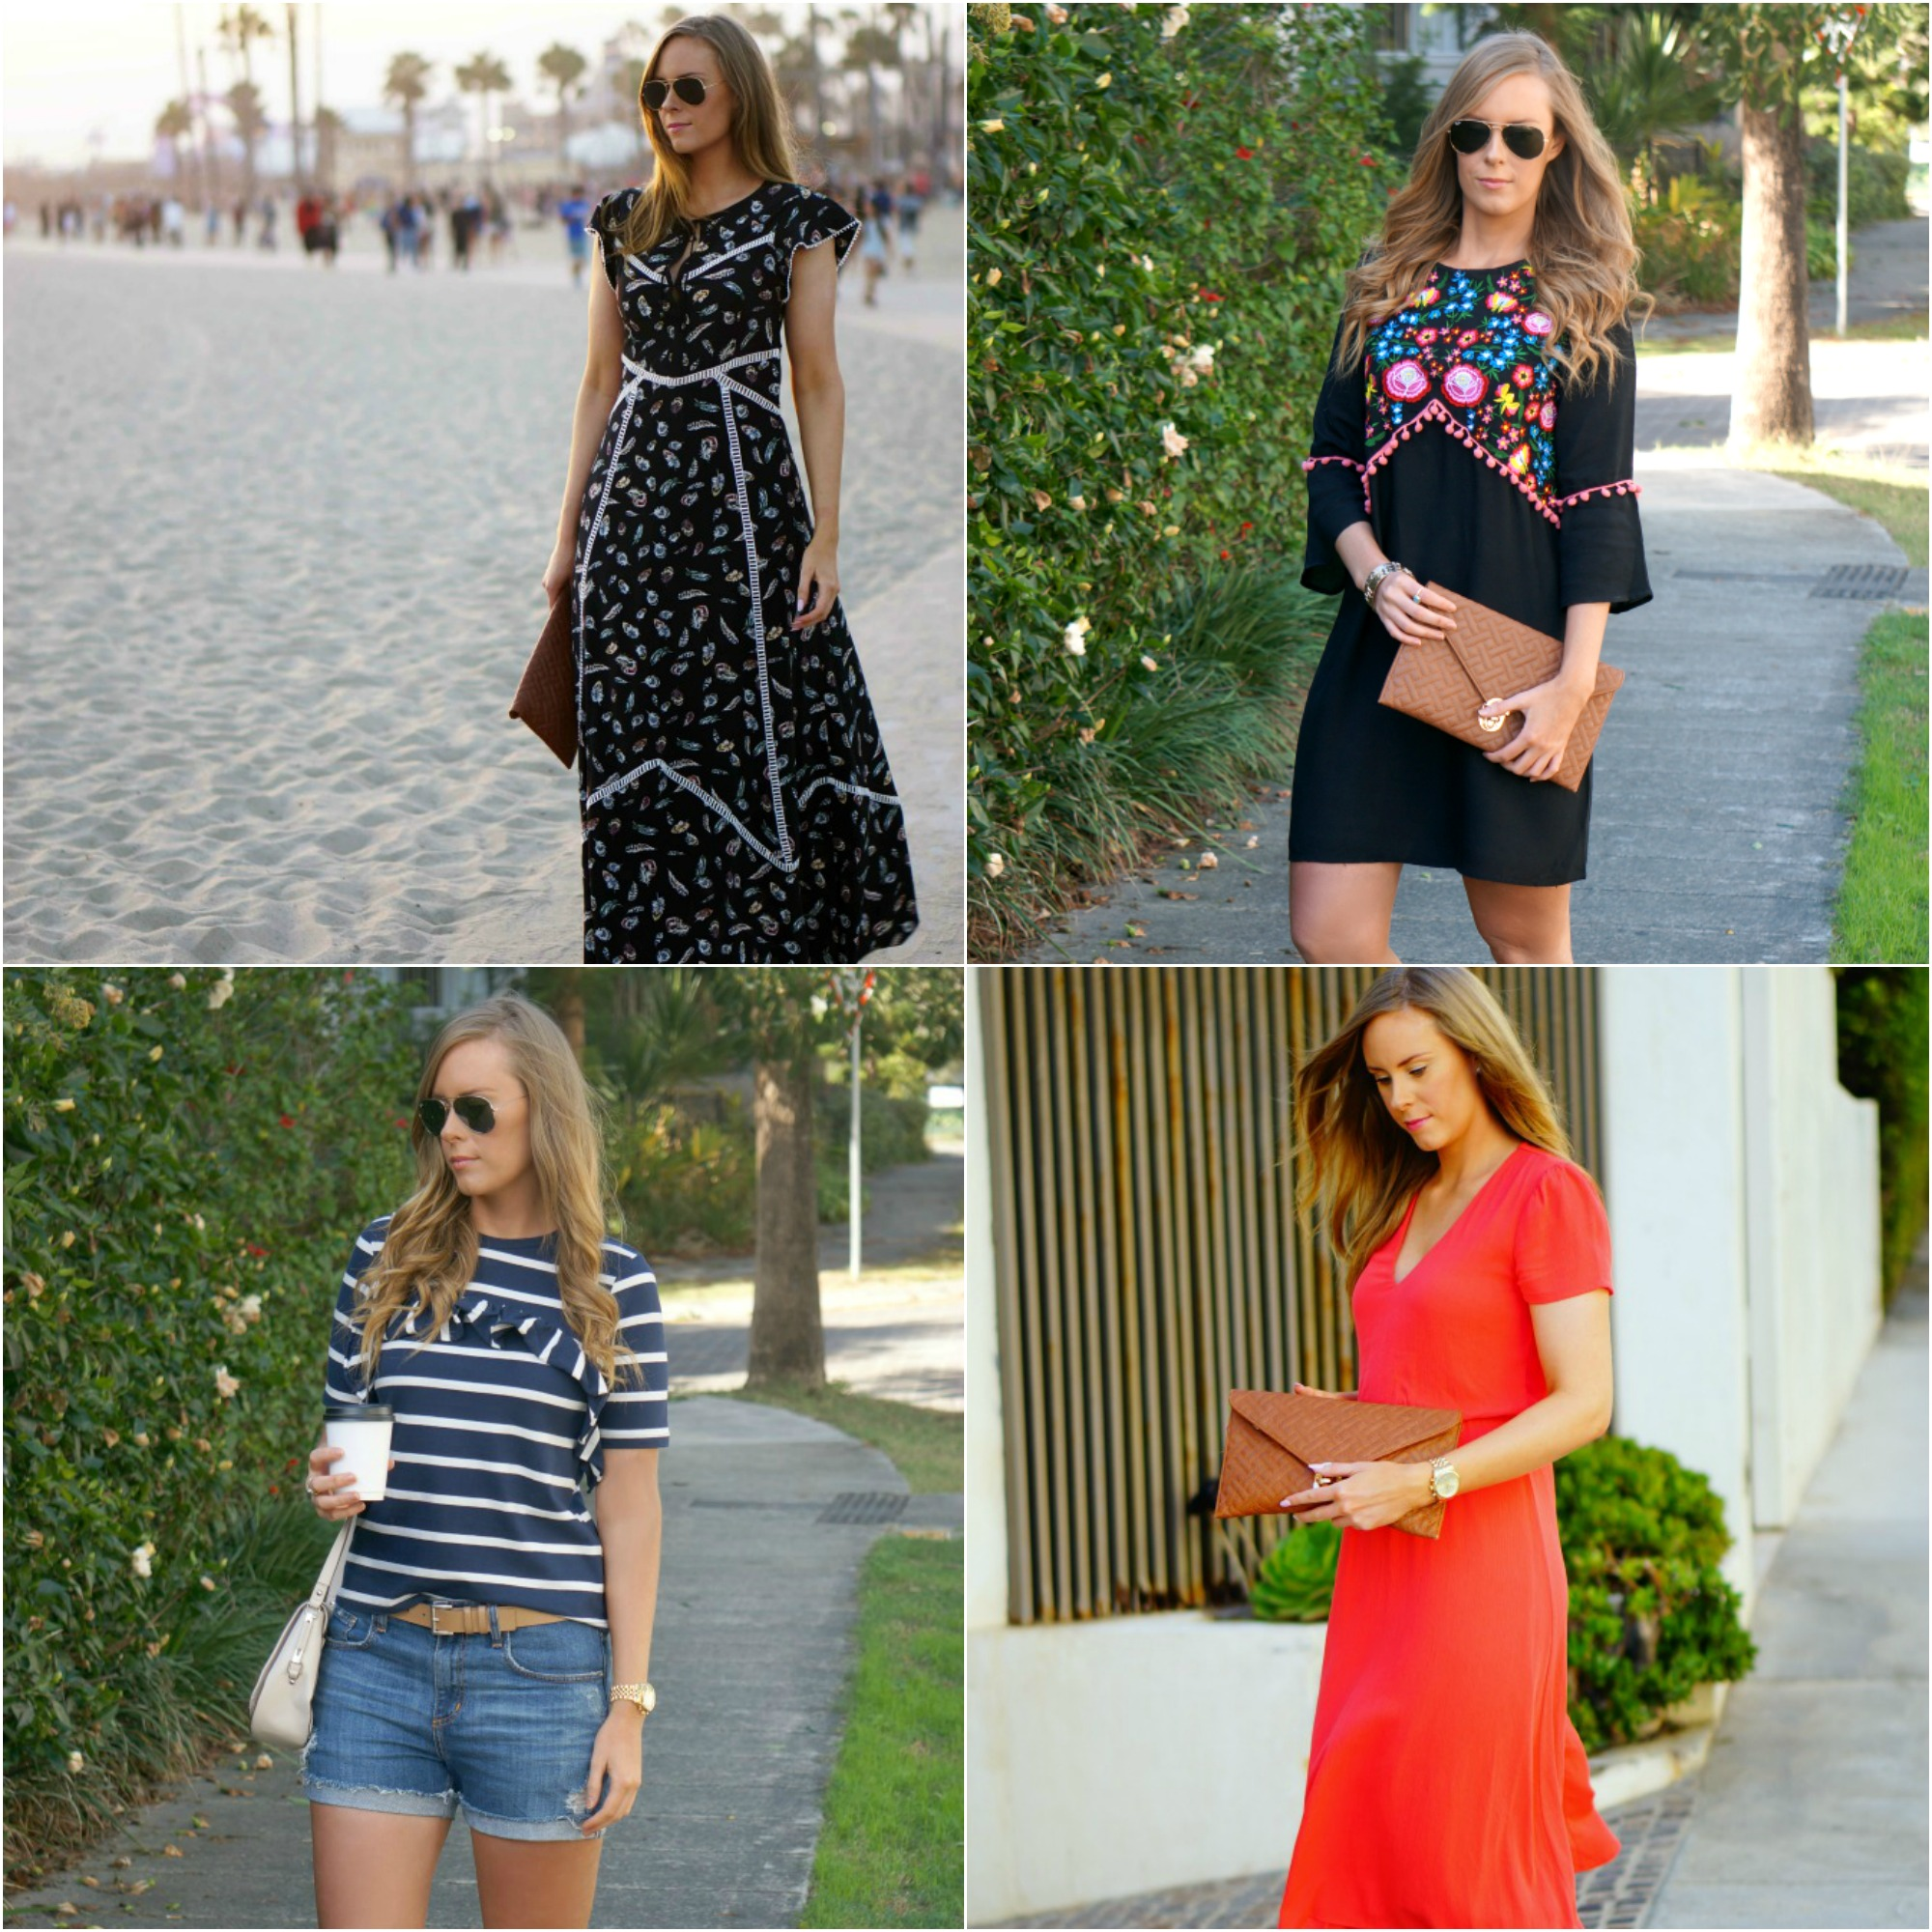 best summer outfit ideas style elixir blog lauren slade fashion blogger the kooples maxi dress pom pom kaftan stripe asos tee